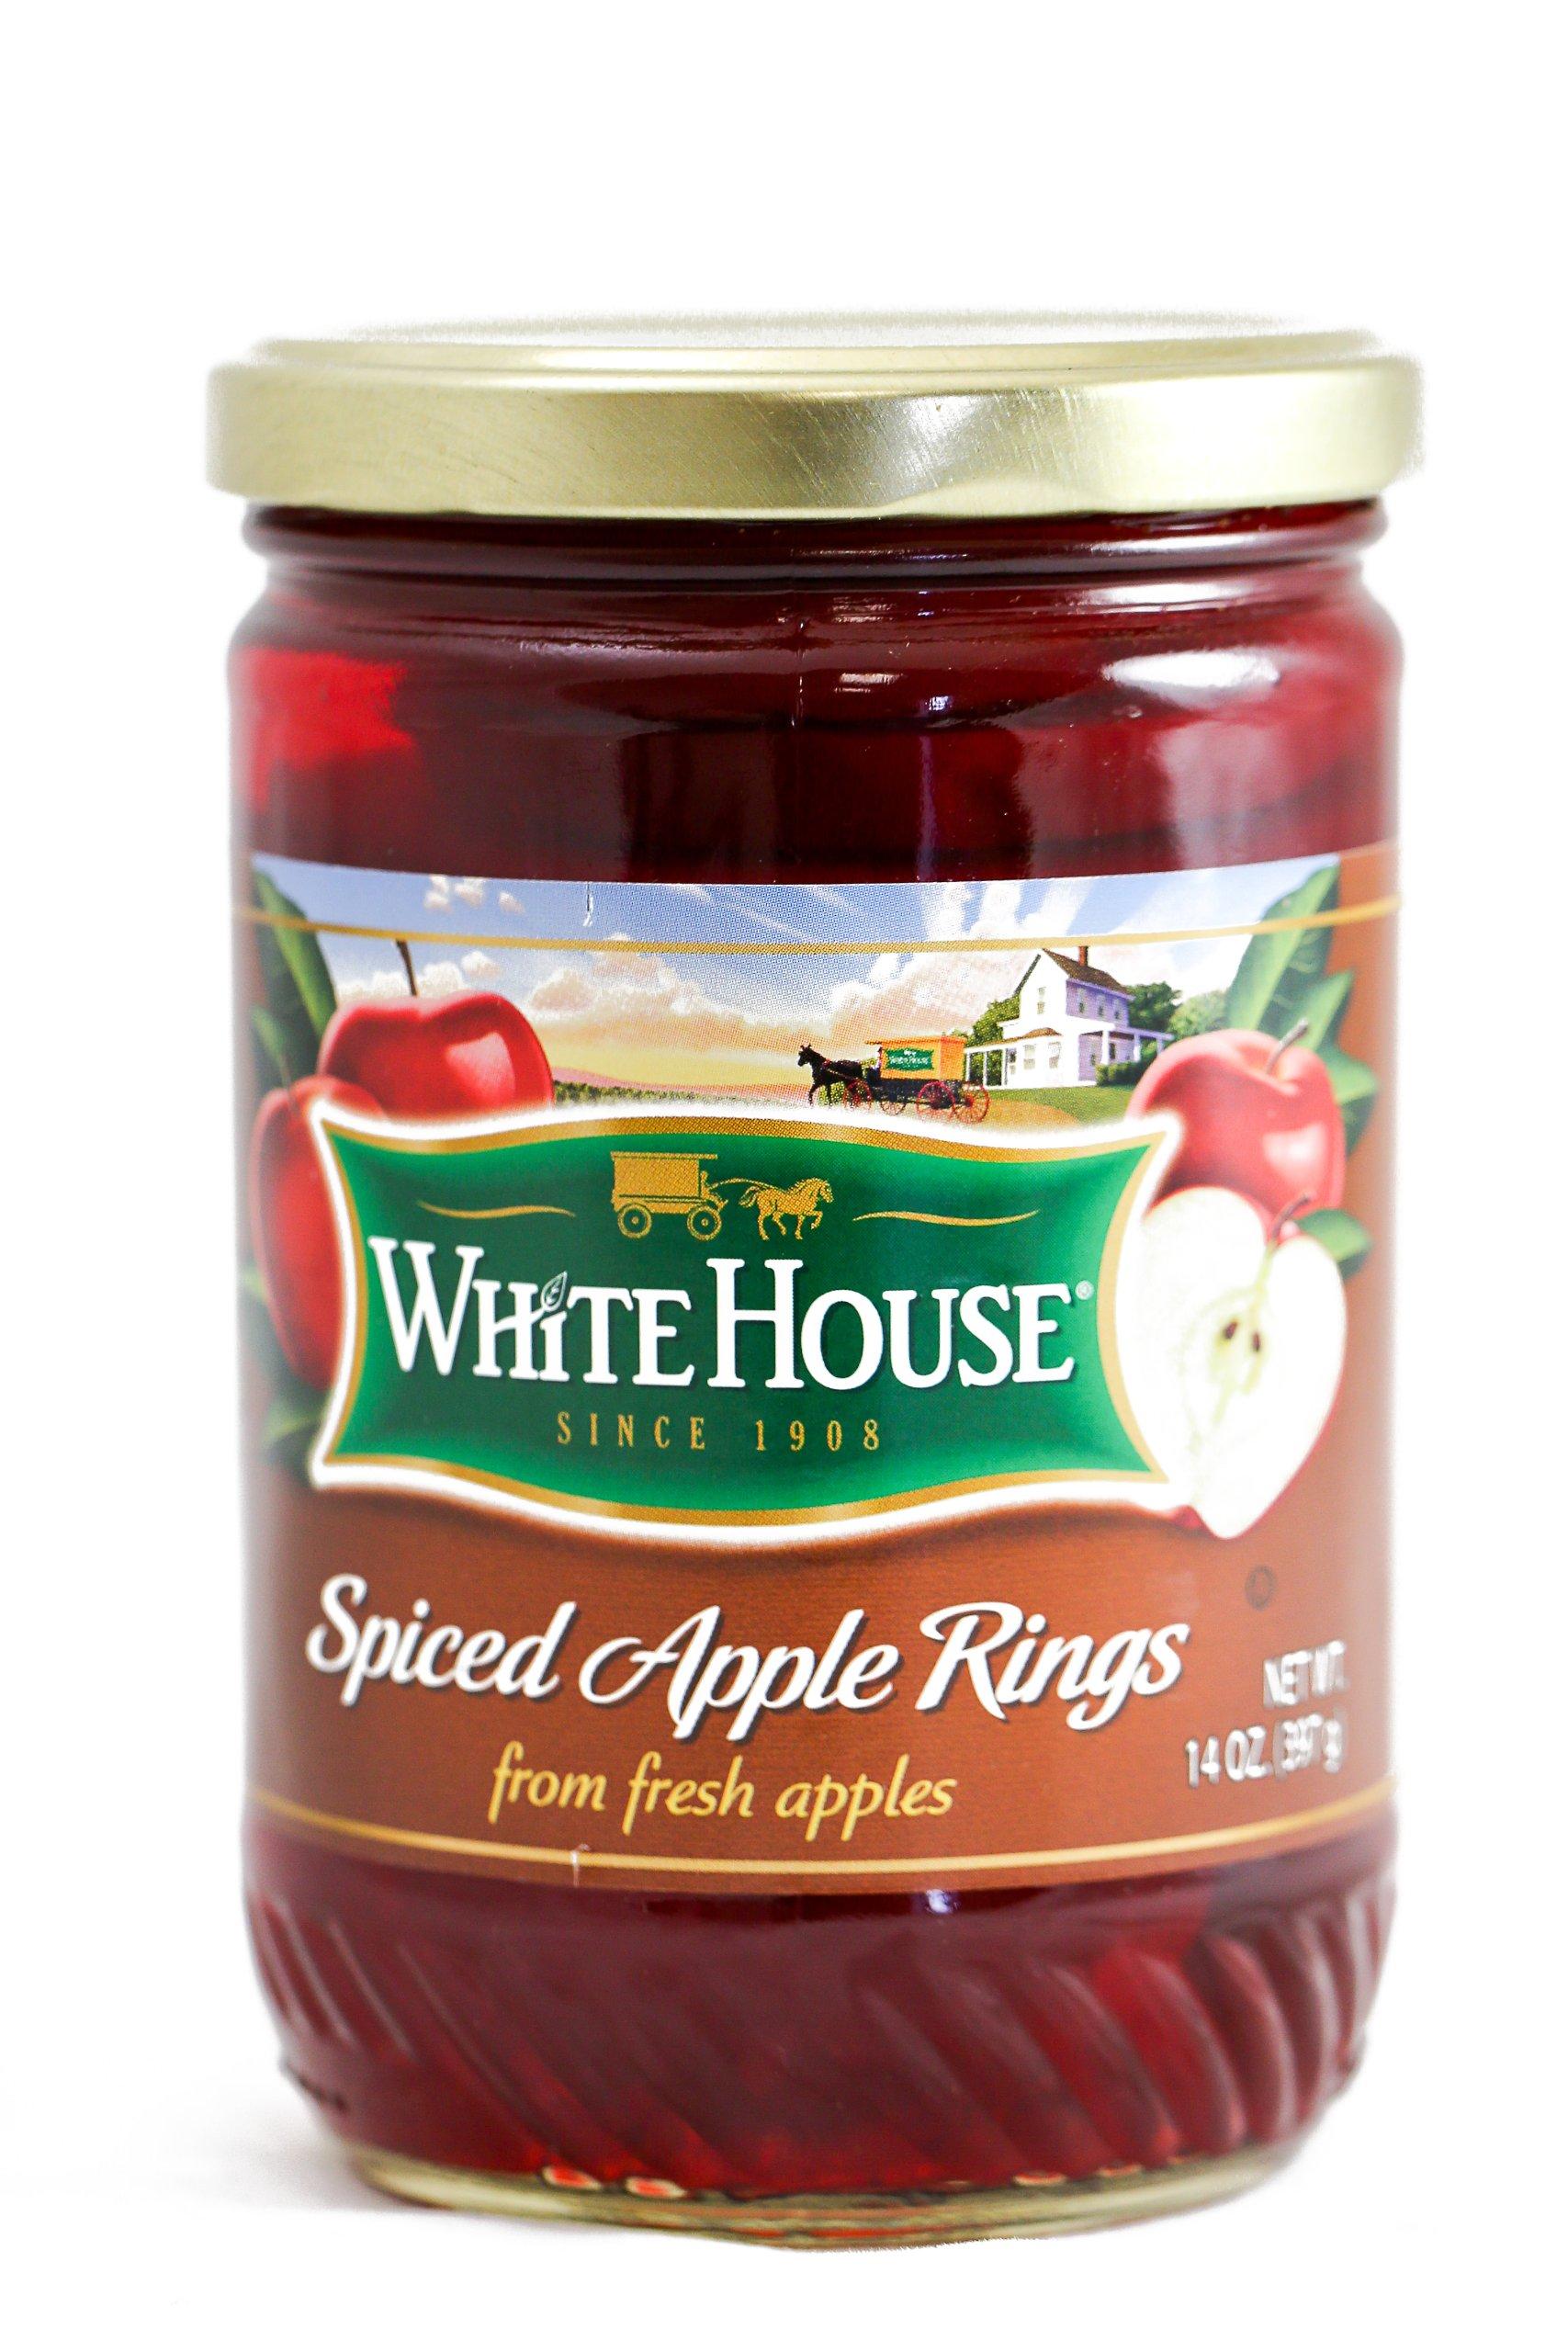 White House Spiced Apple Rings 14 oz